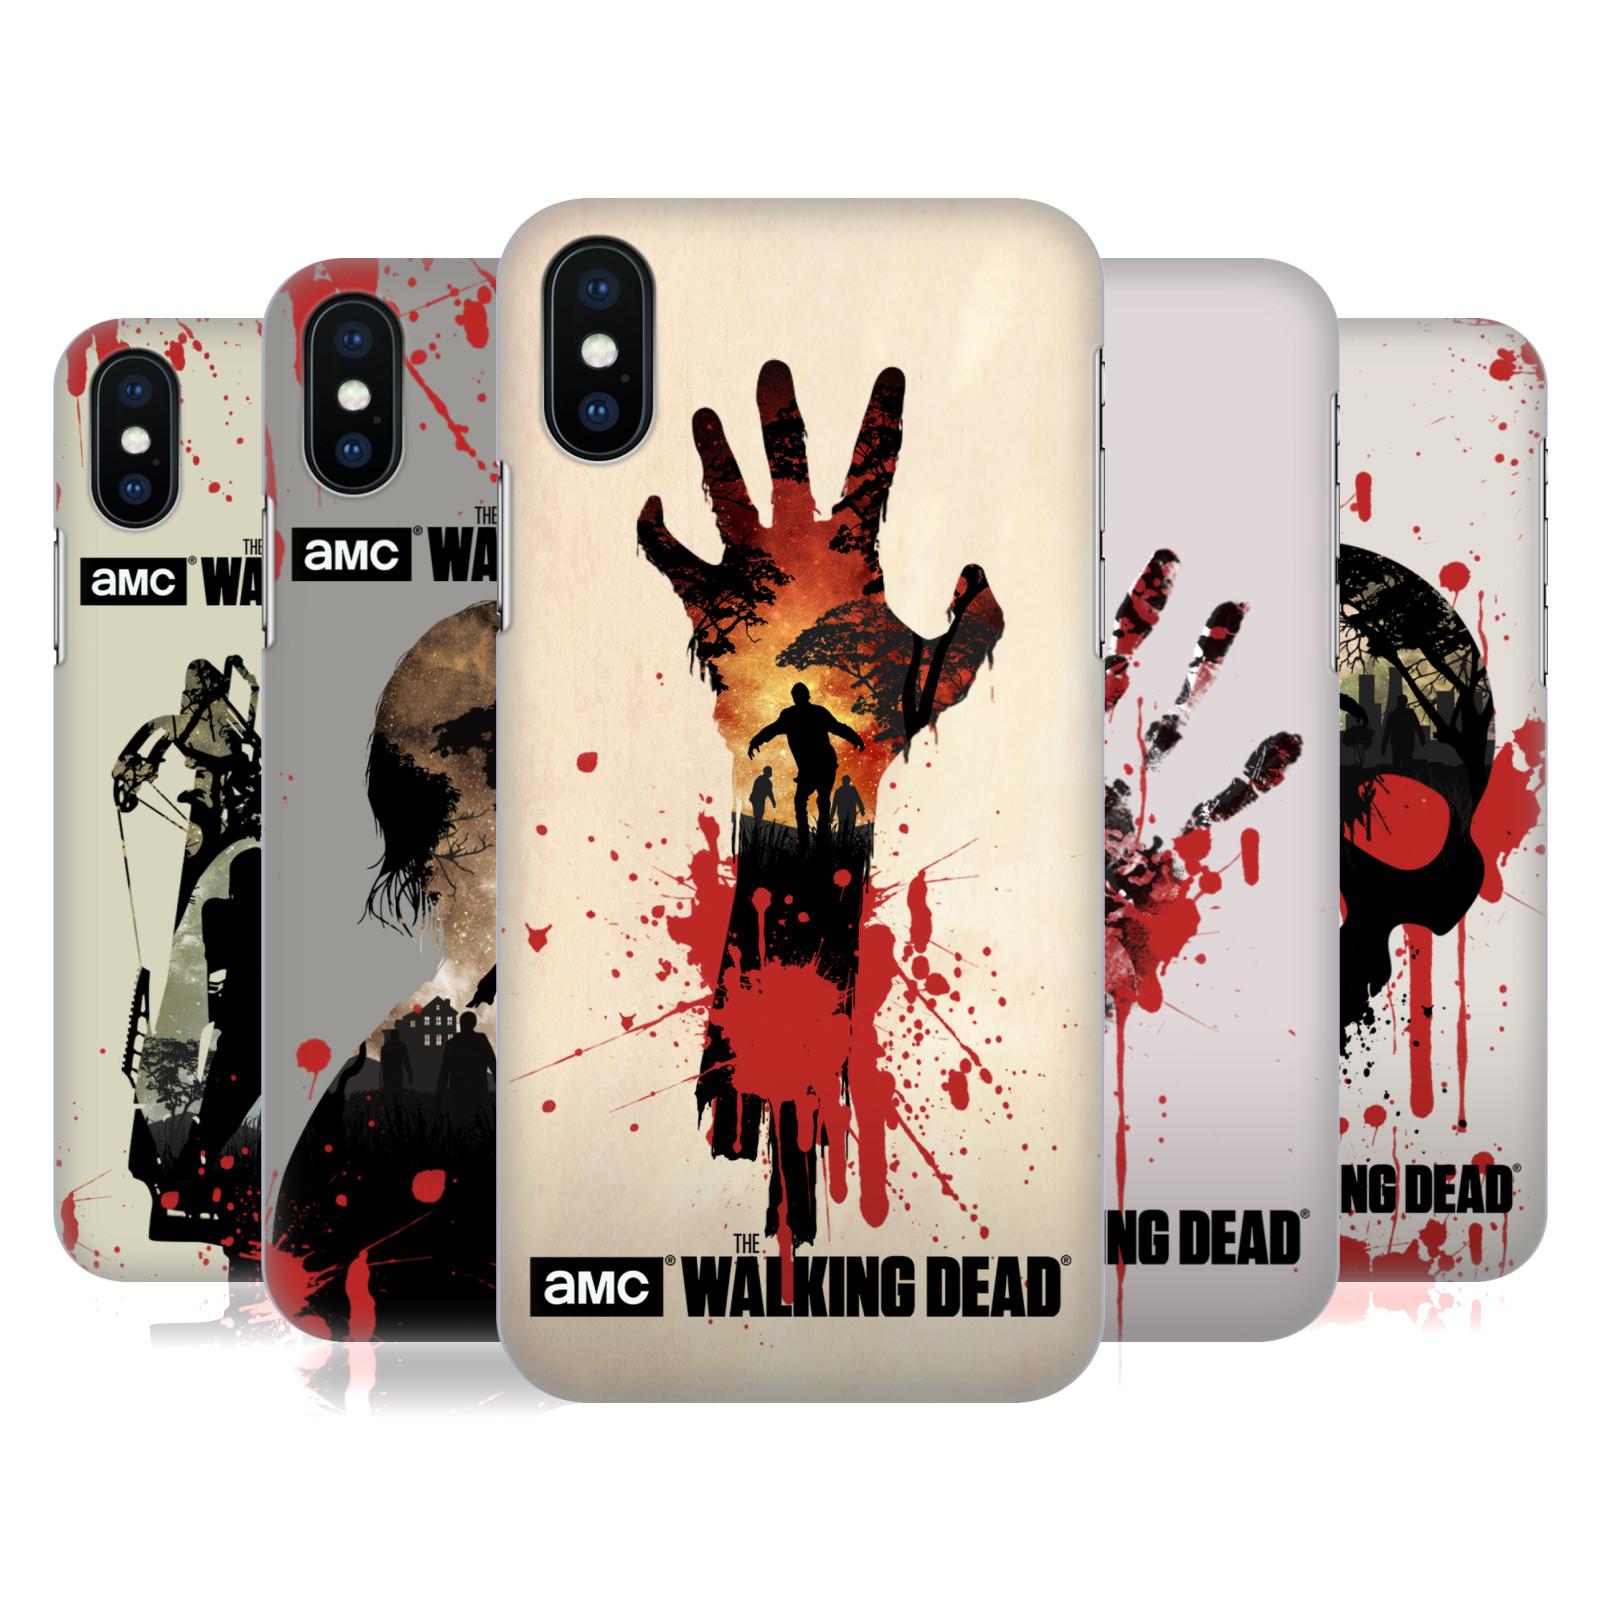 AMC The Walking Dead Silhouettes